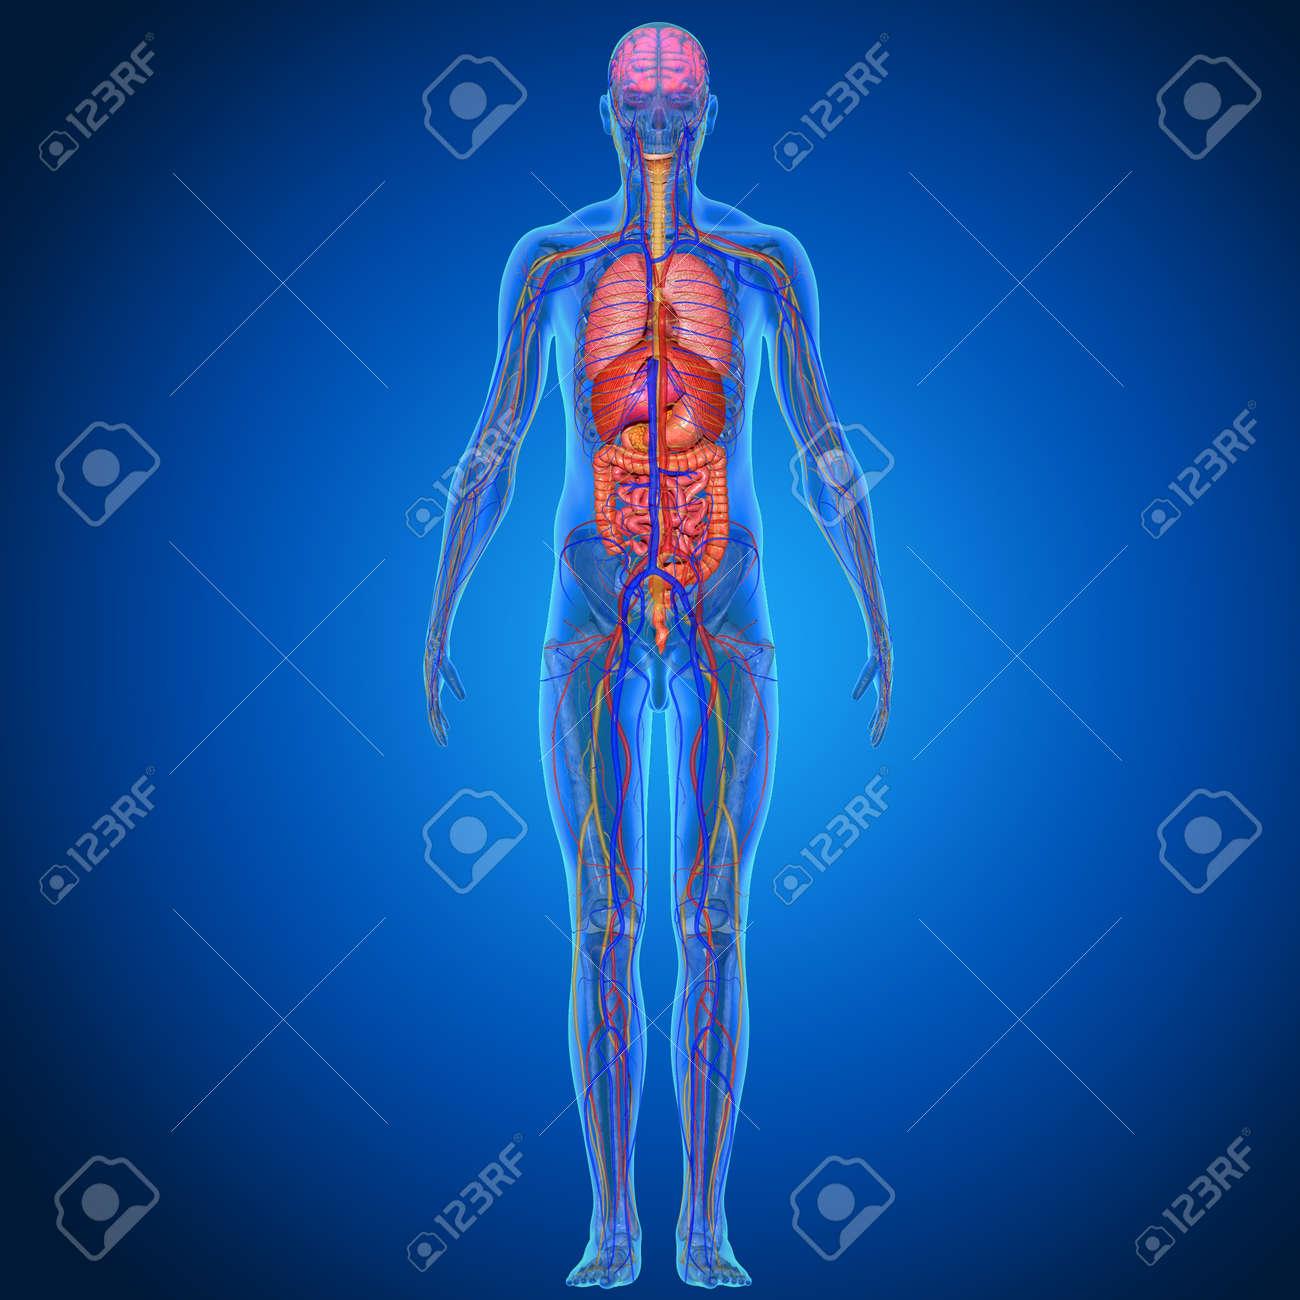 Human Anatomy Stock Photo - 36478315